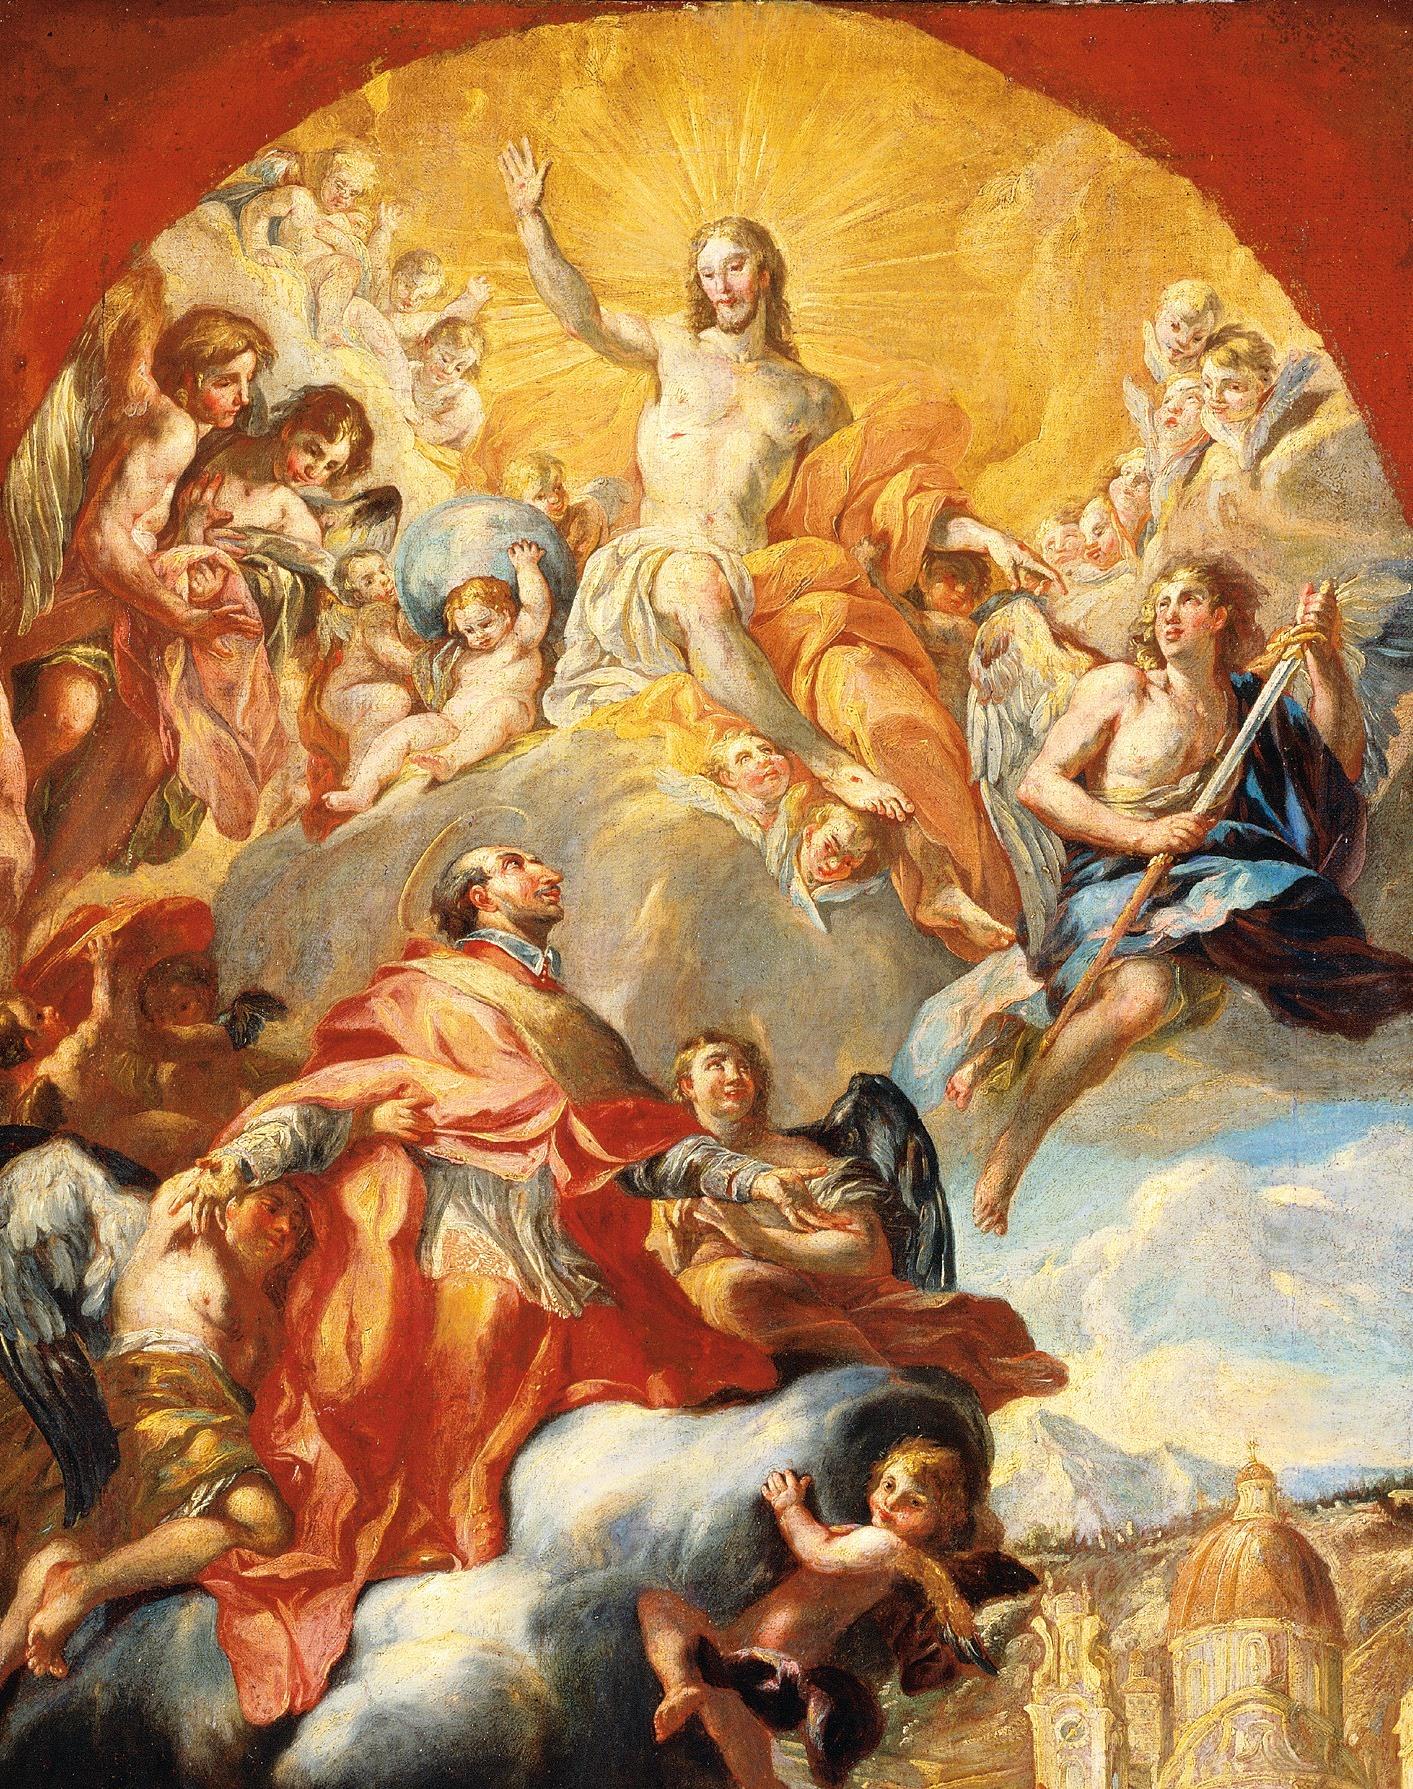 Veranstaltung Geste Baroque. Collections de Salzbourg – Louvre, Paris im DomQuartier Salzburg